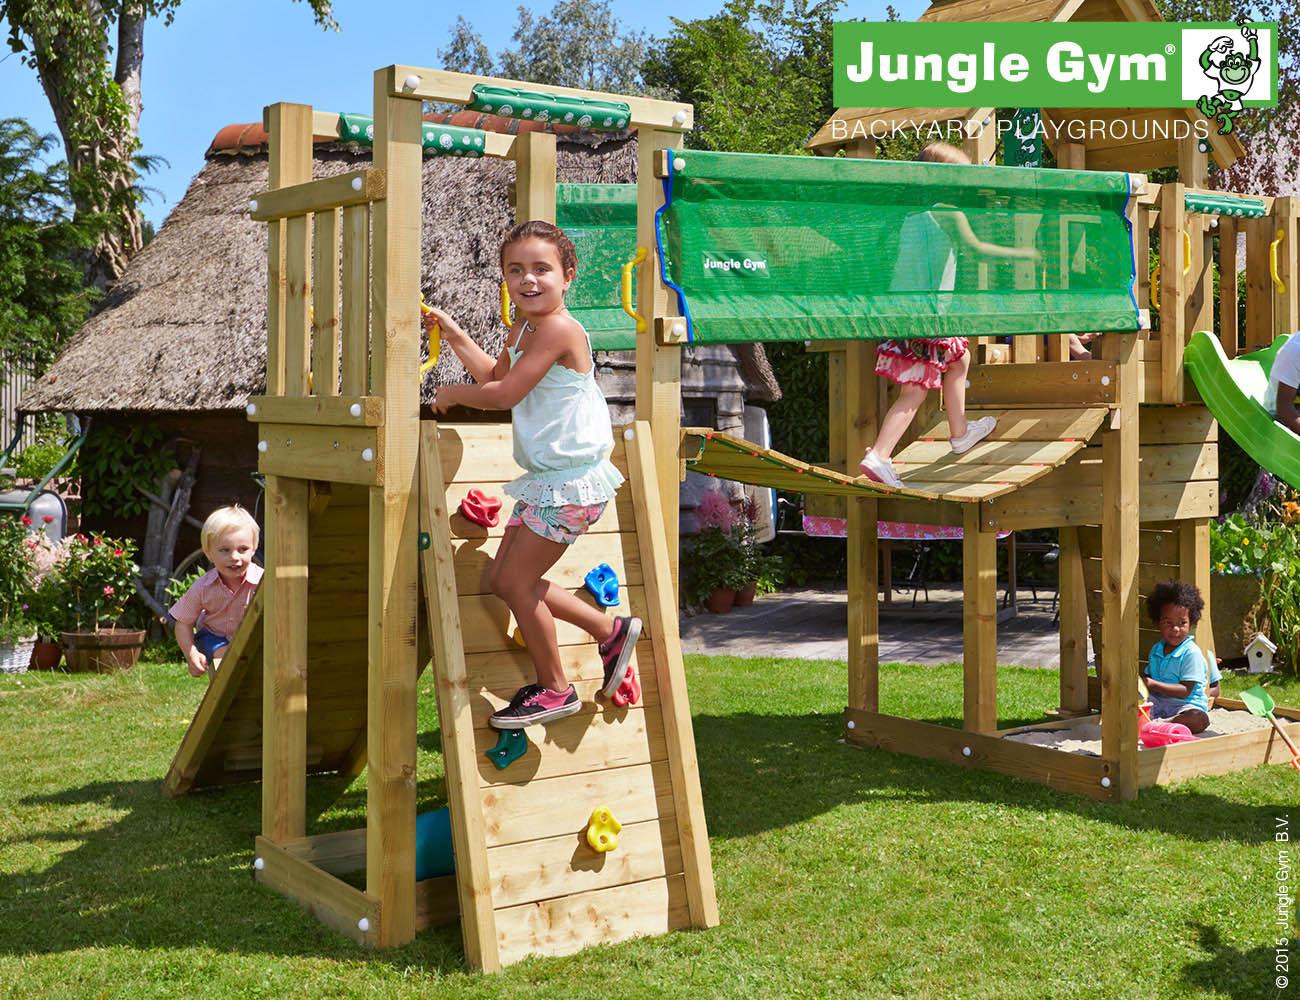 Klettergerüst Hängebrücke : Jungle gym hängebrücke anbaumodul bridge spielturm precogs